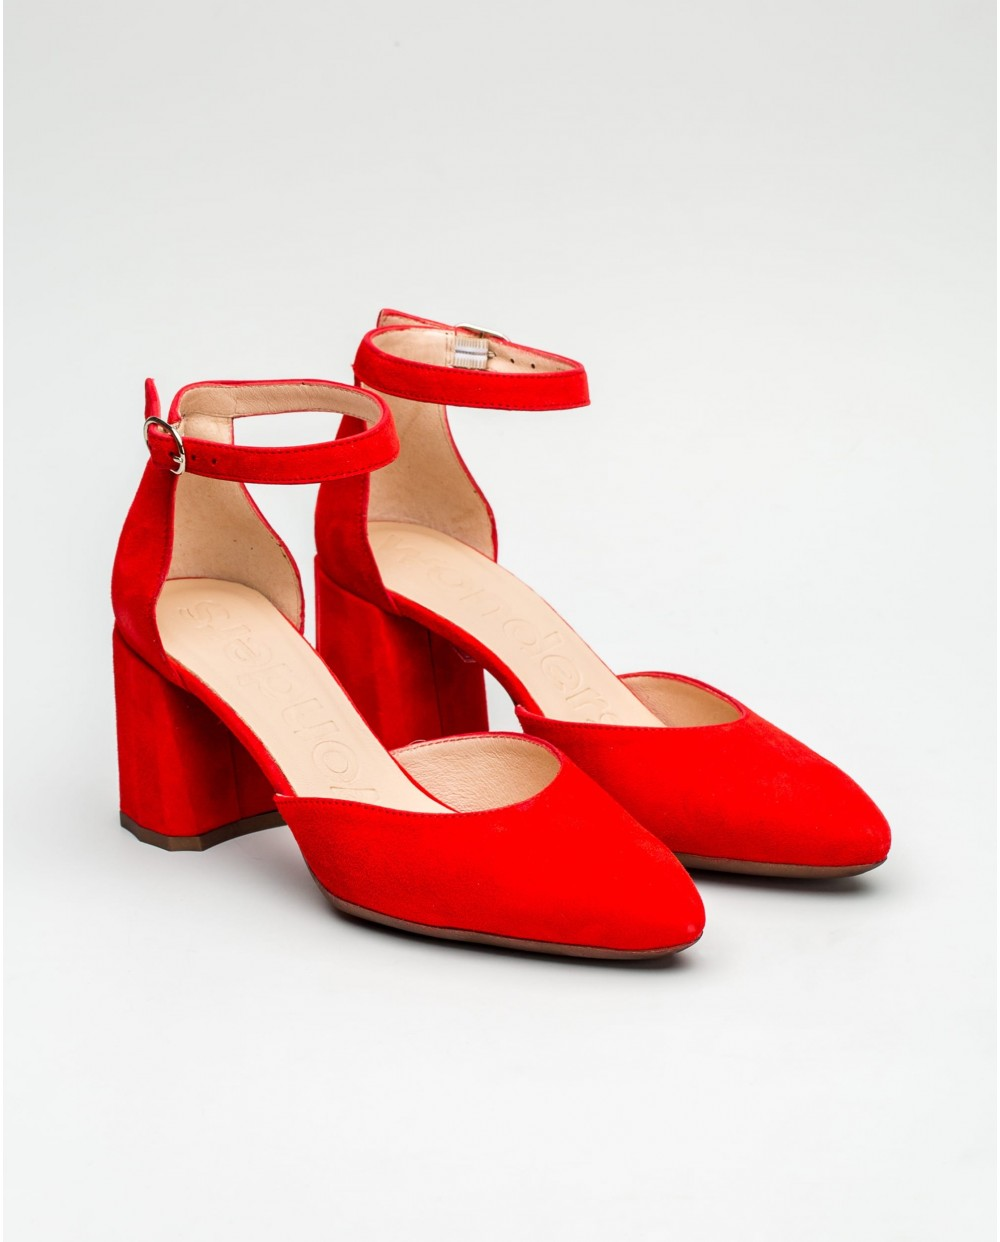 Wonders-Outlet-Backless high heeled shoe